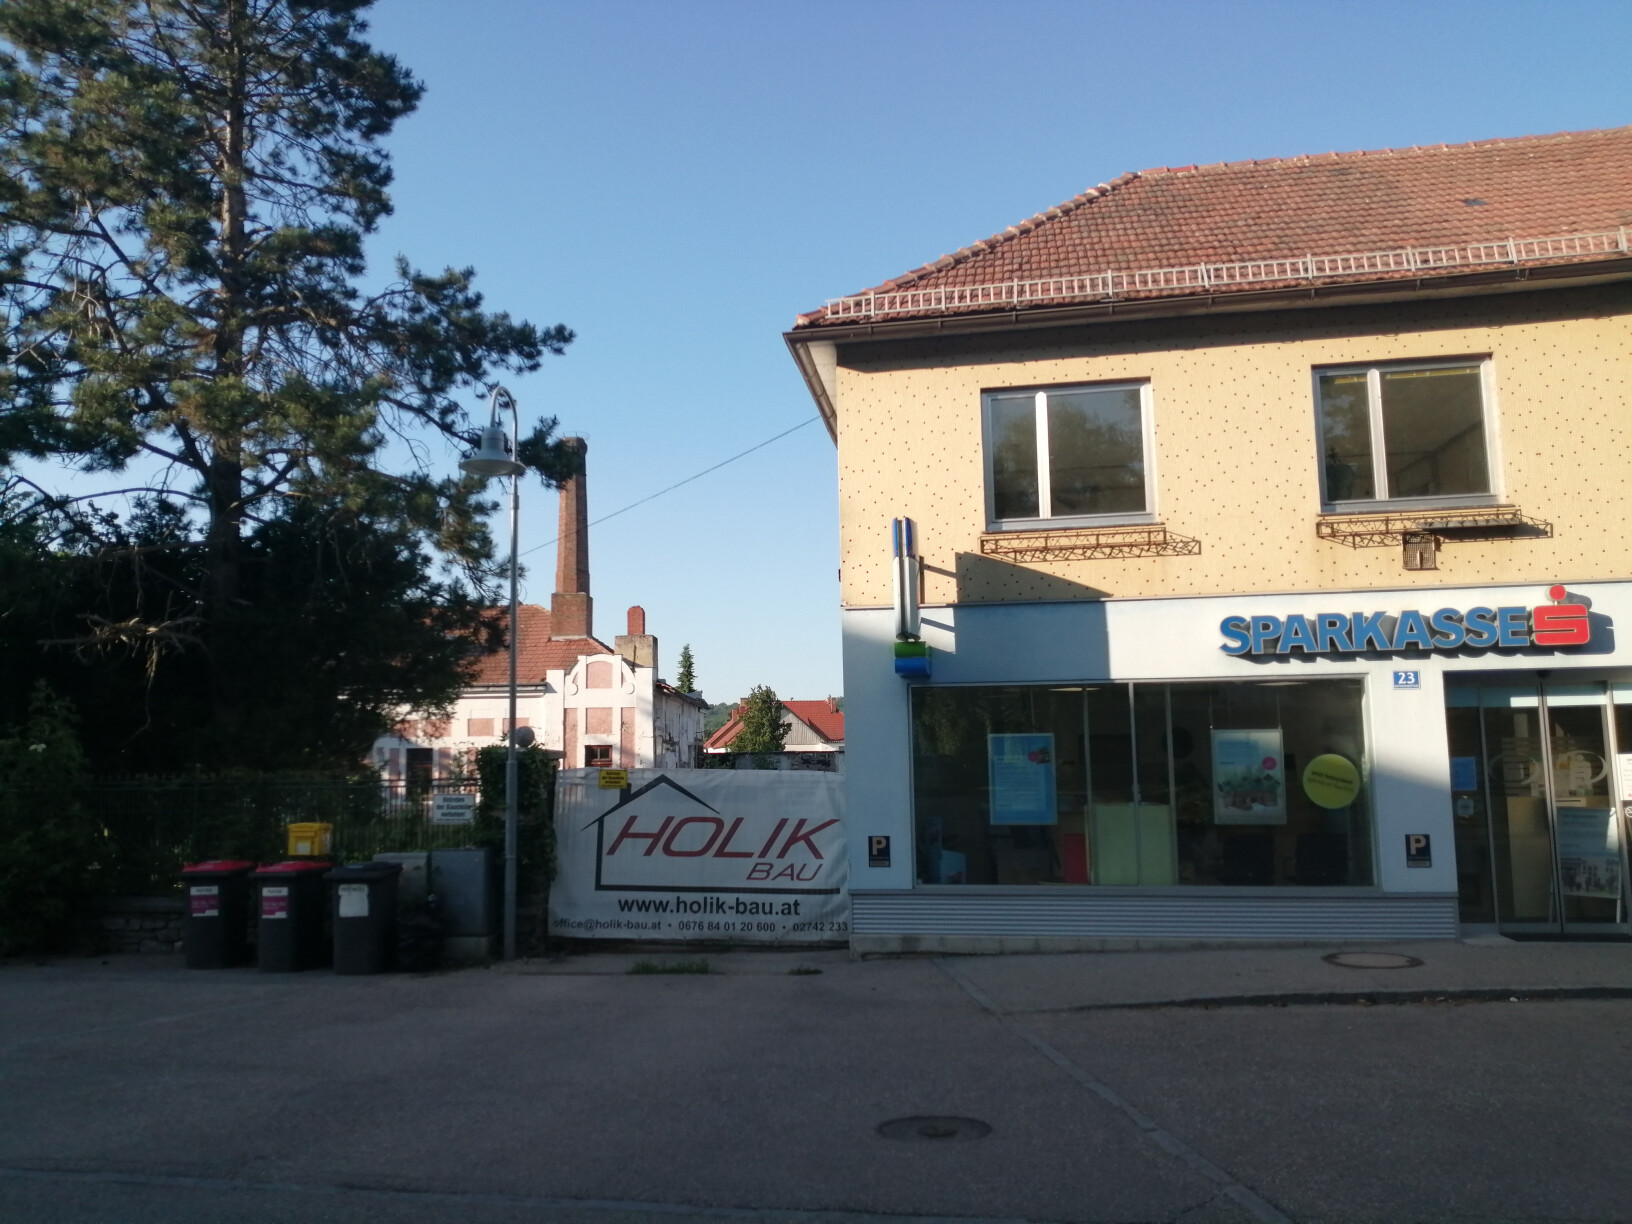 Sparkasse Pottenbrunn